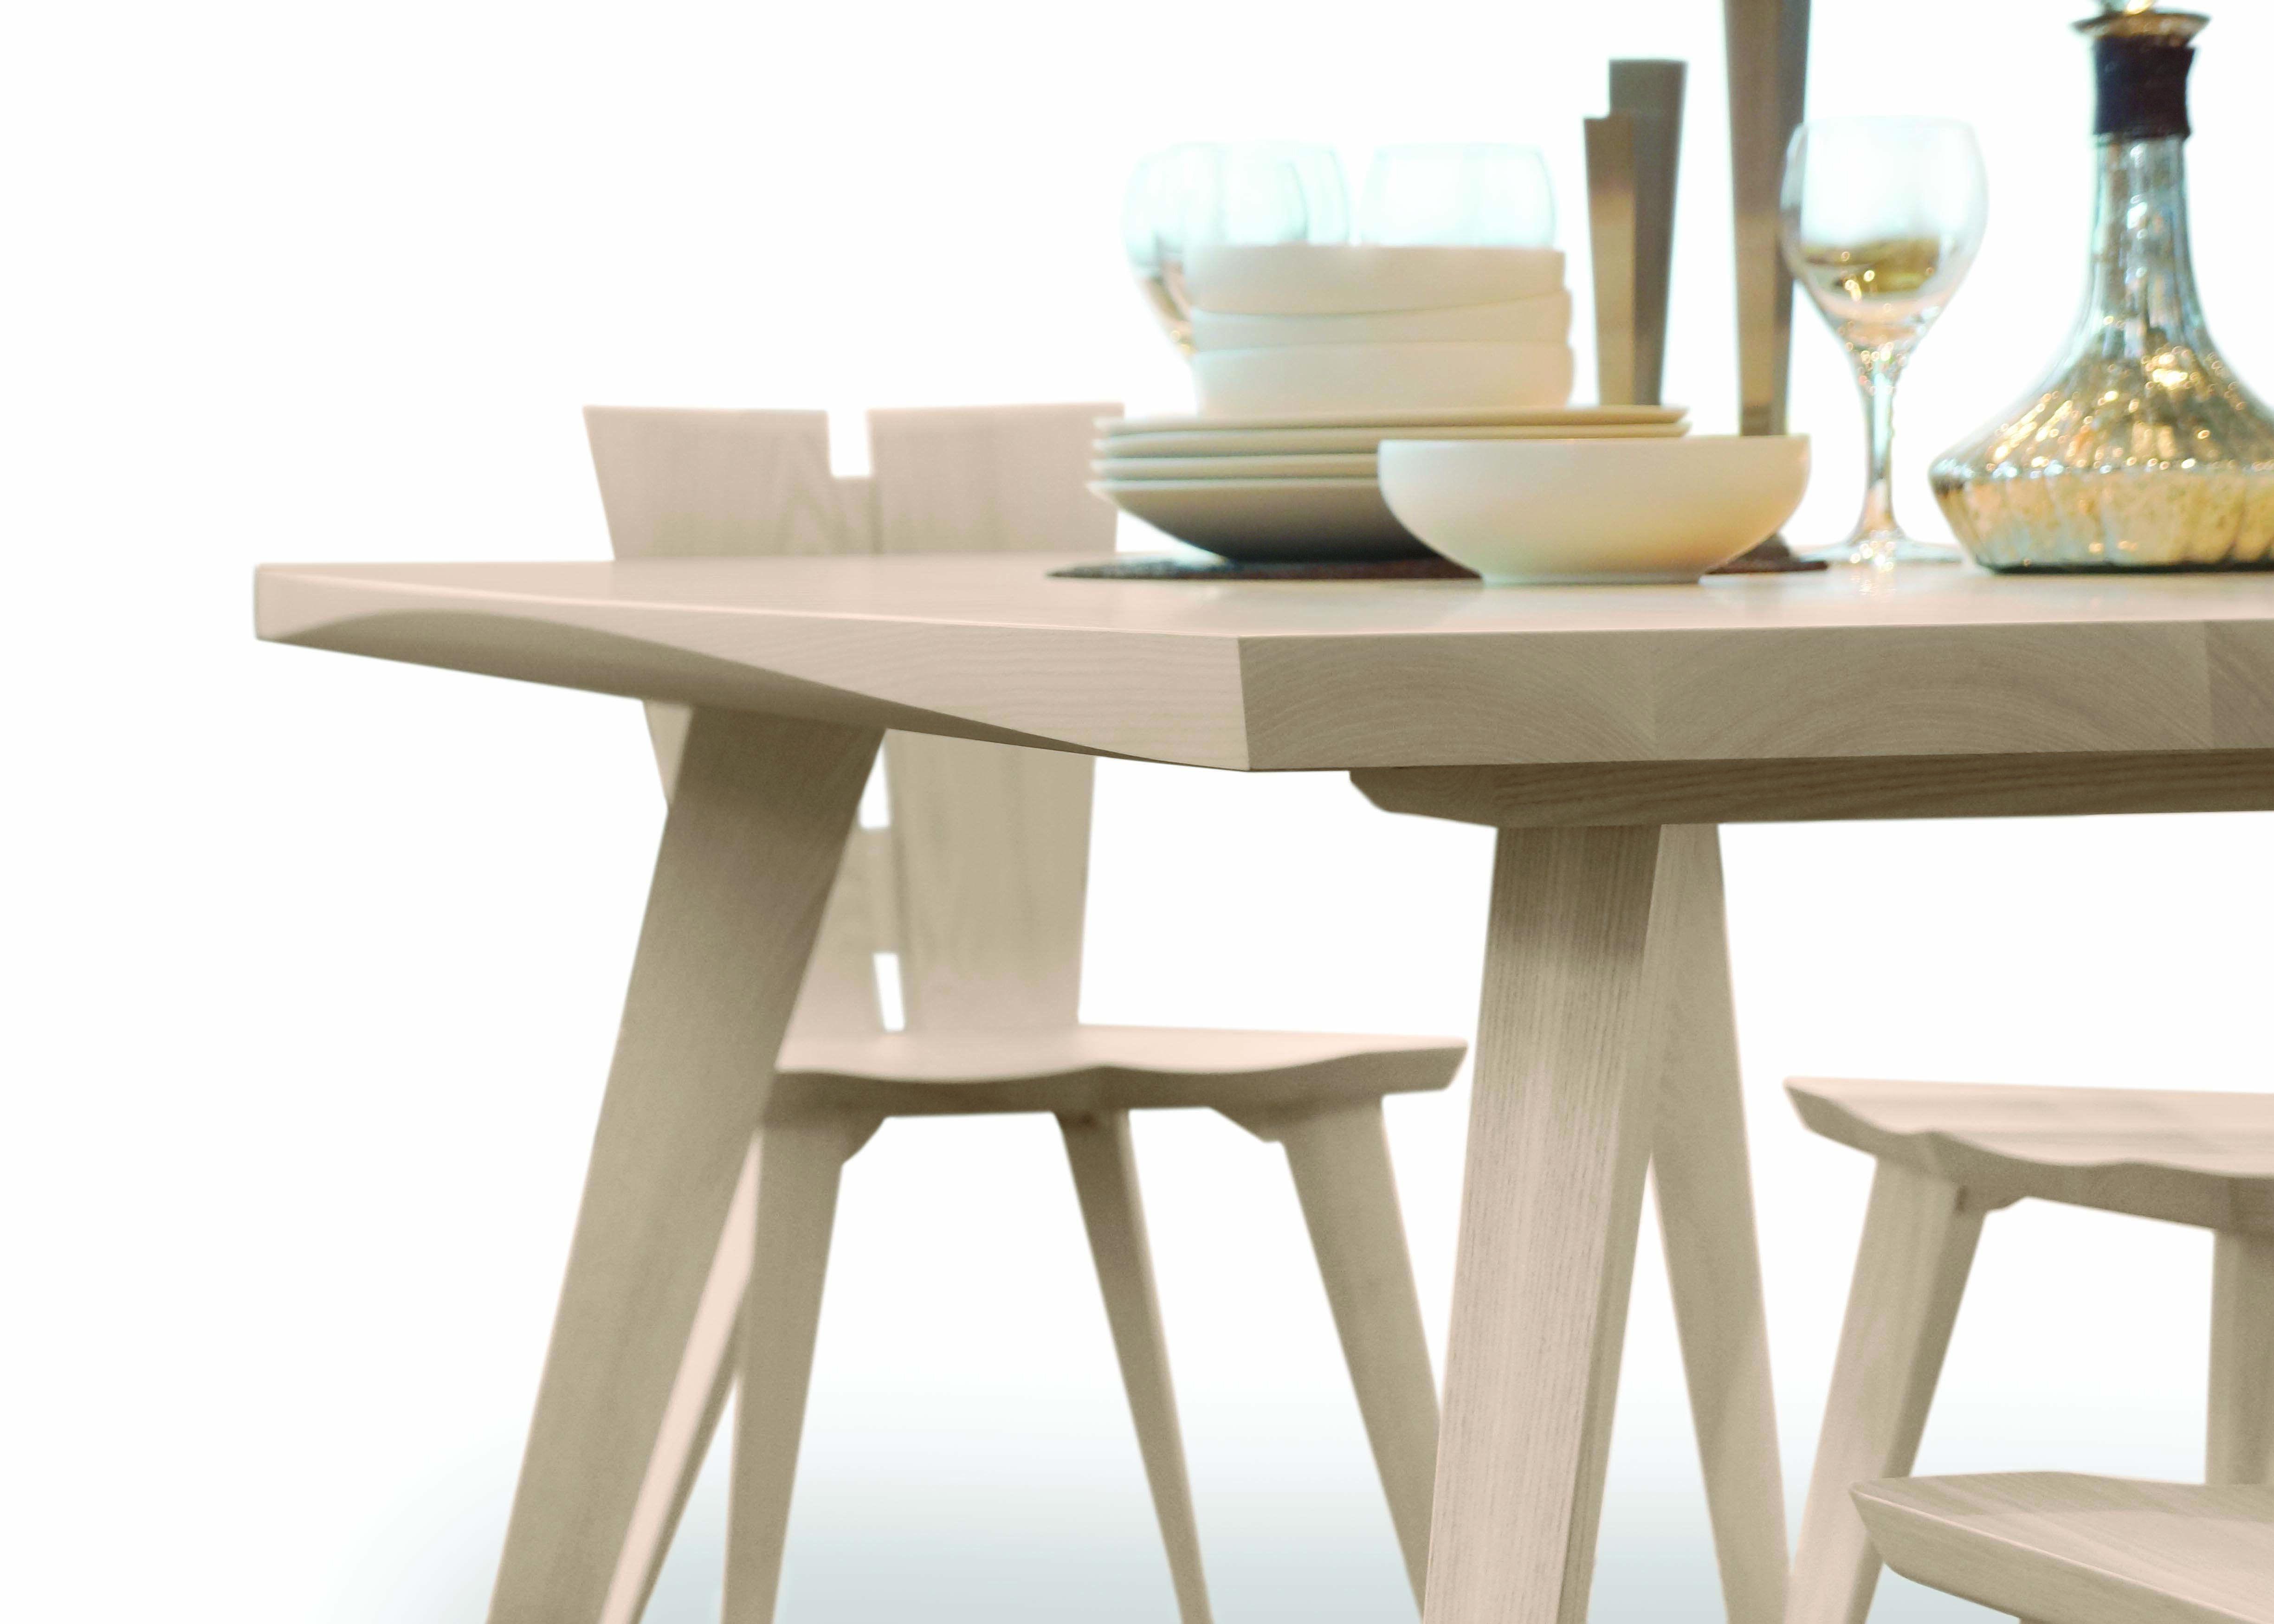 Trend Urban Alignment Winner   Copeland Furniture, Showplace, 5100  #designonhpmkt #hpmkt #